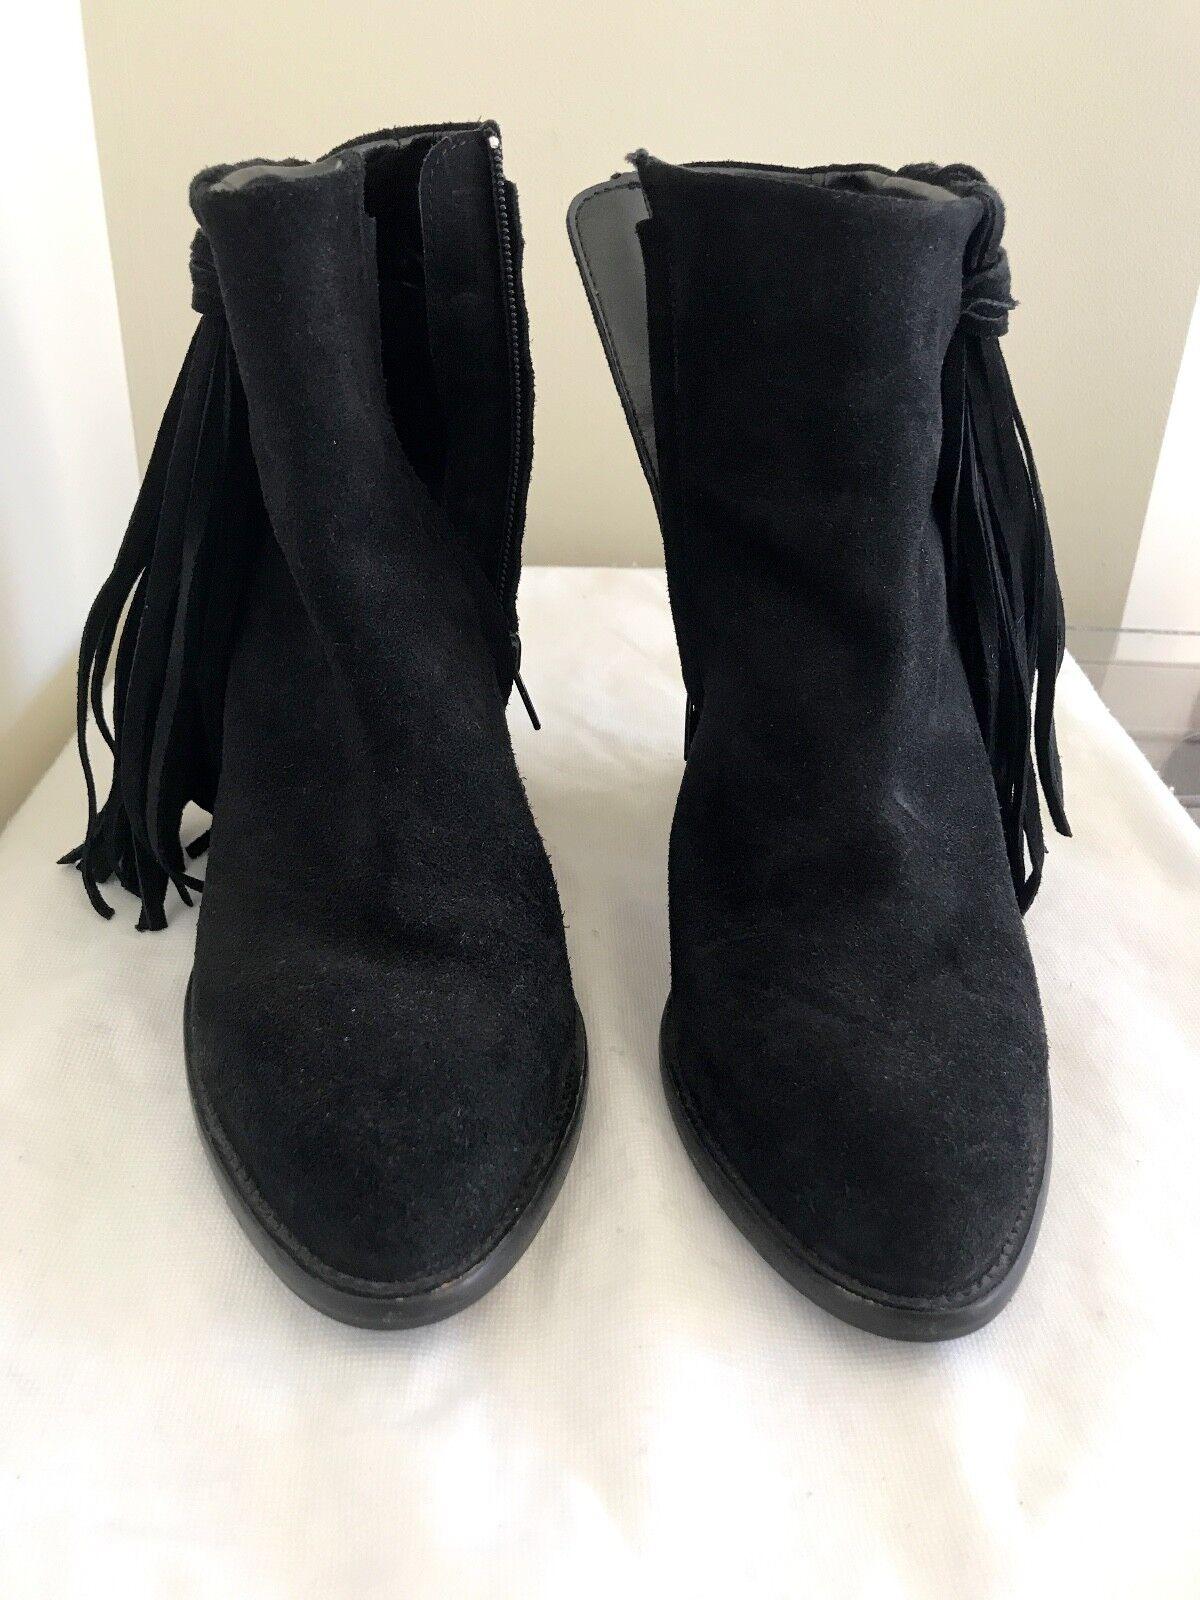 Zara black booties with fringe